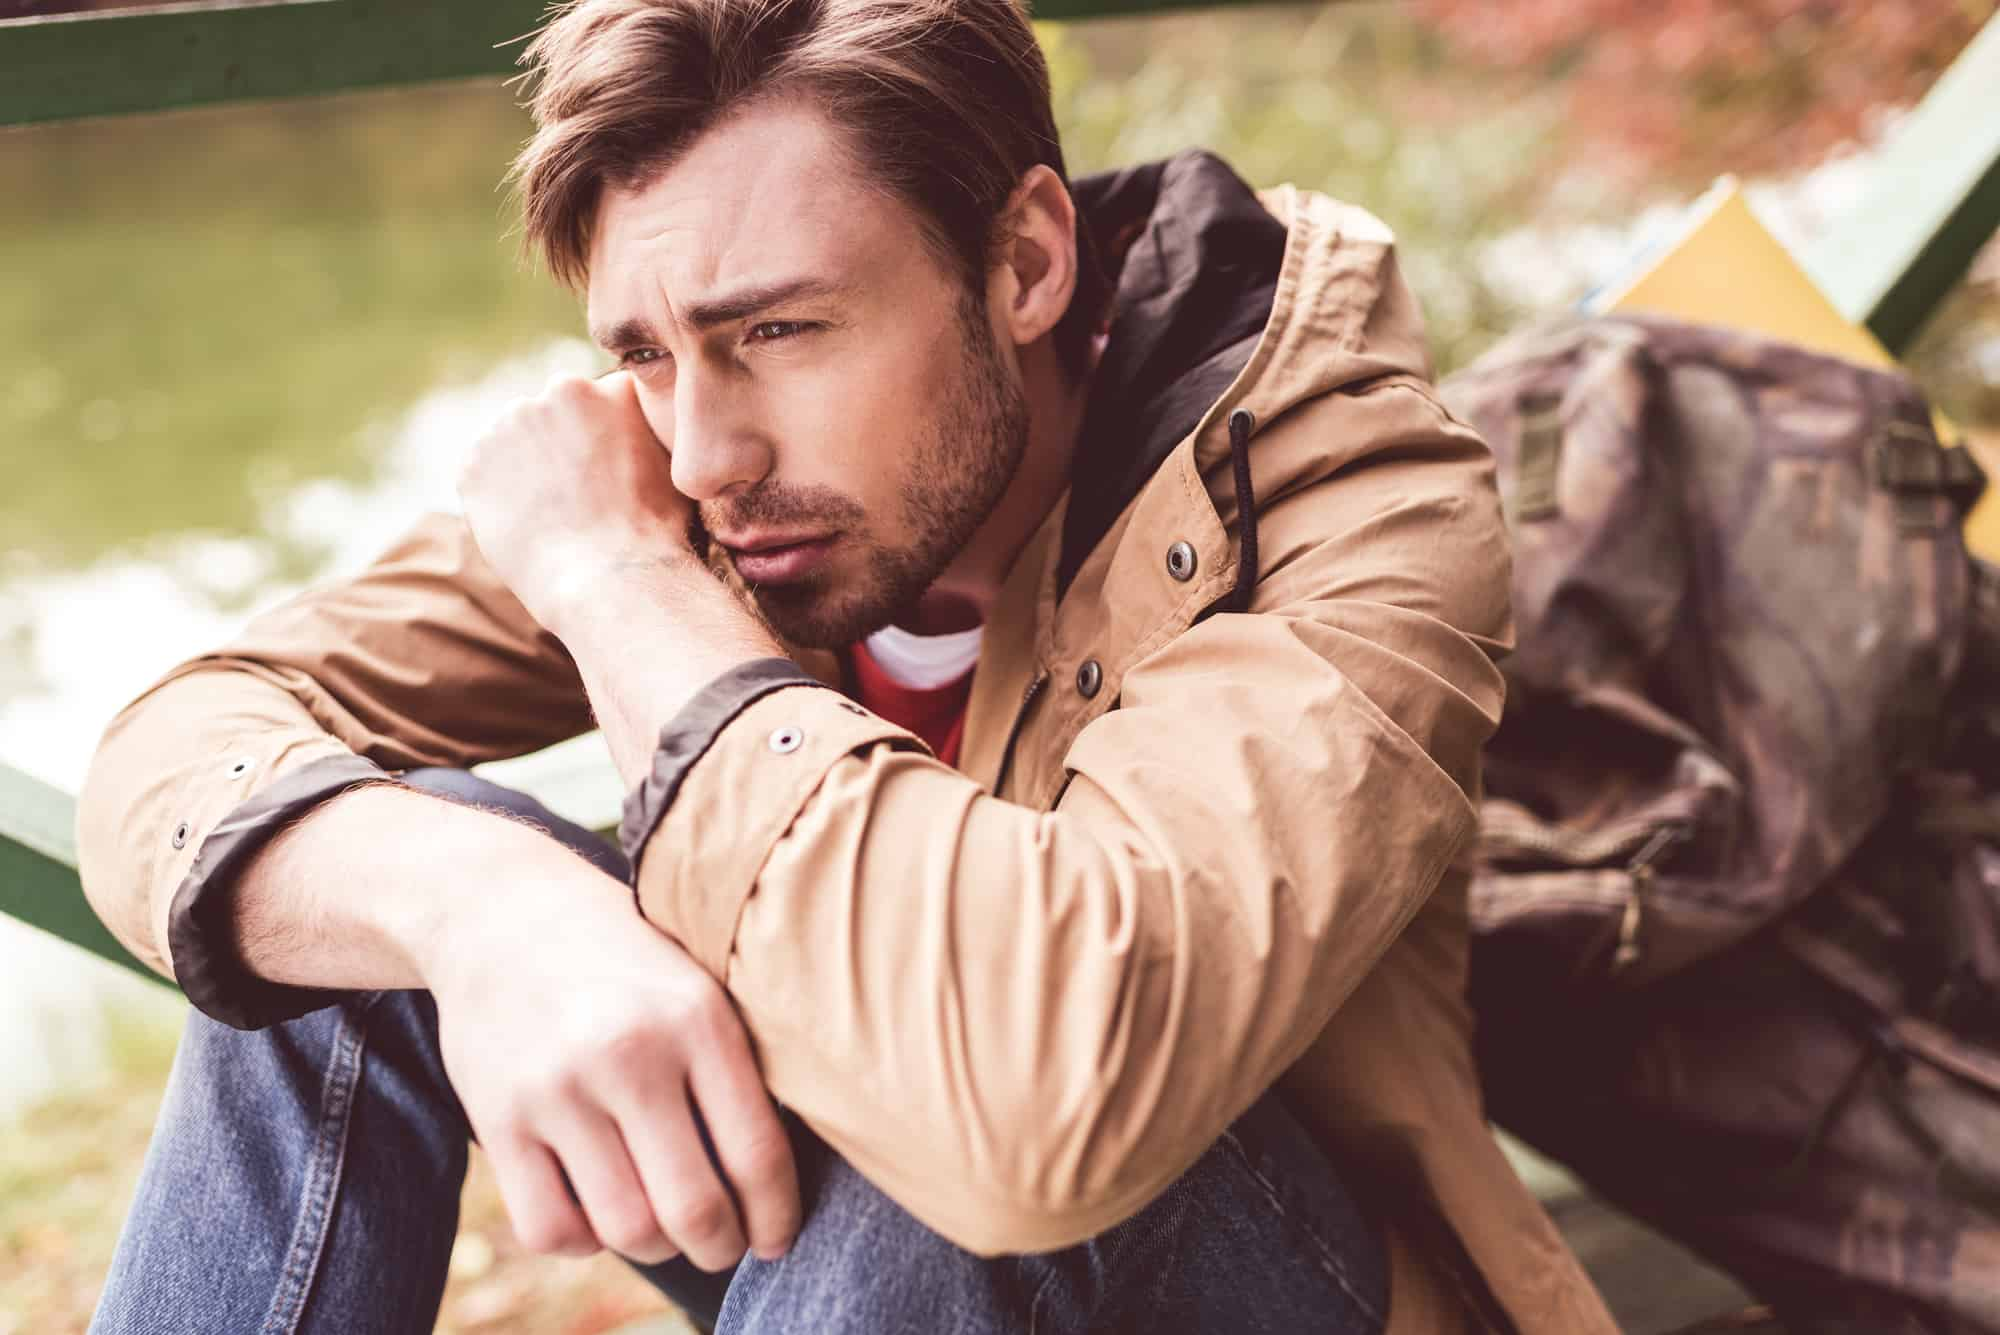 Hurt after a do breakup men 6 Steps